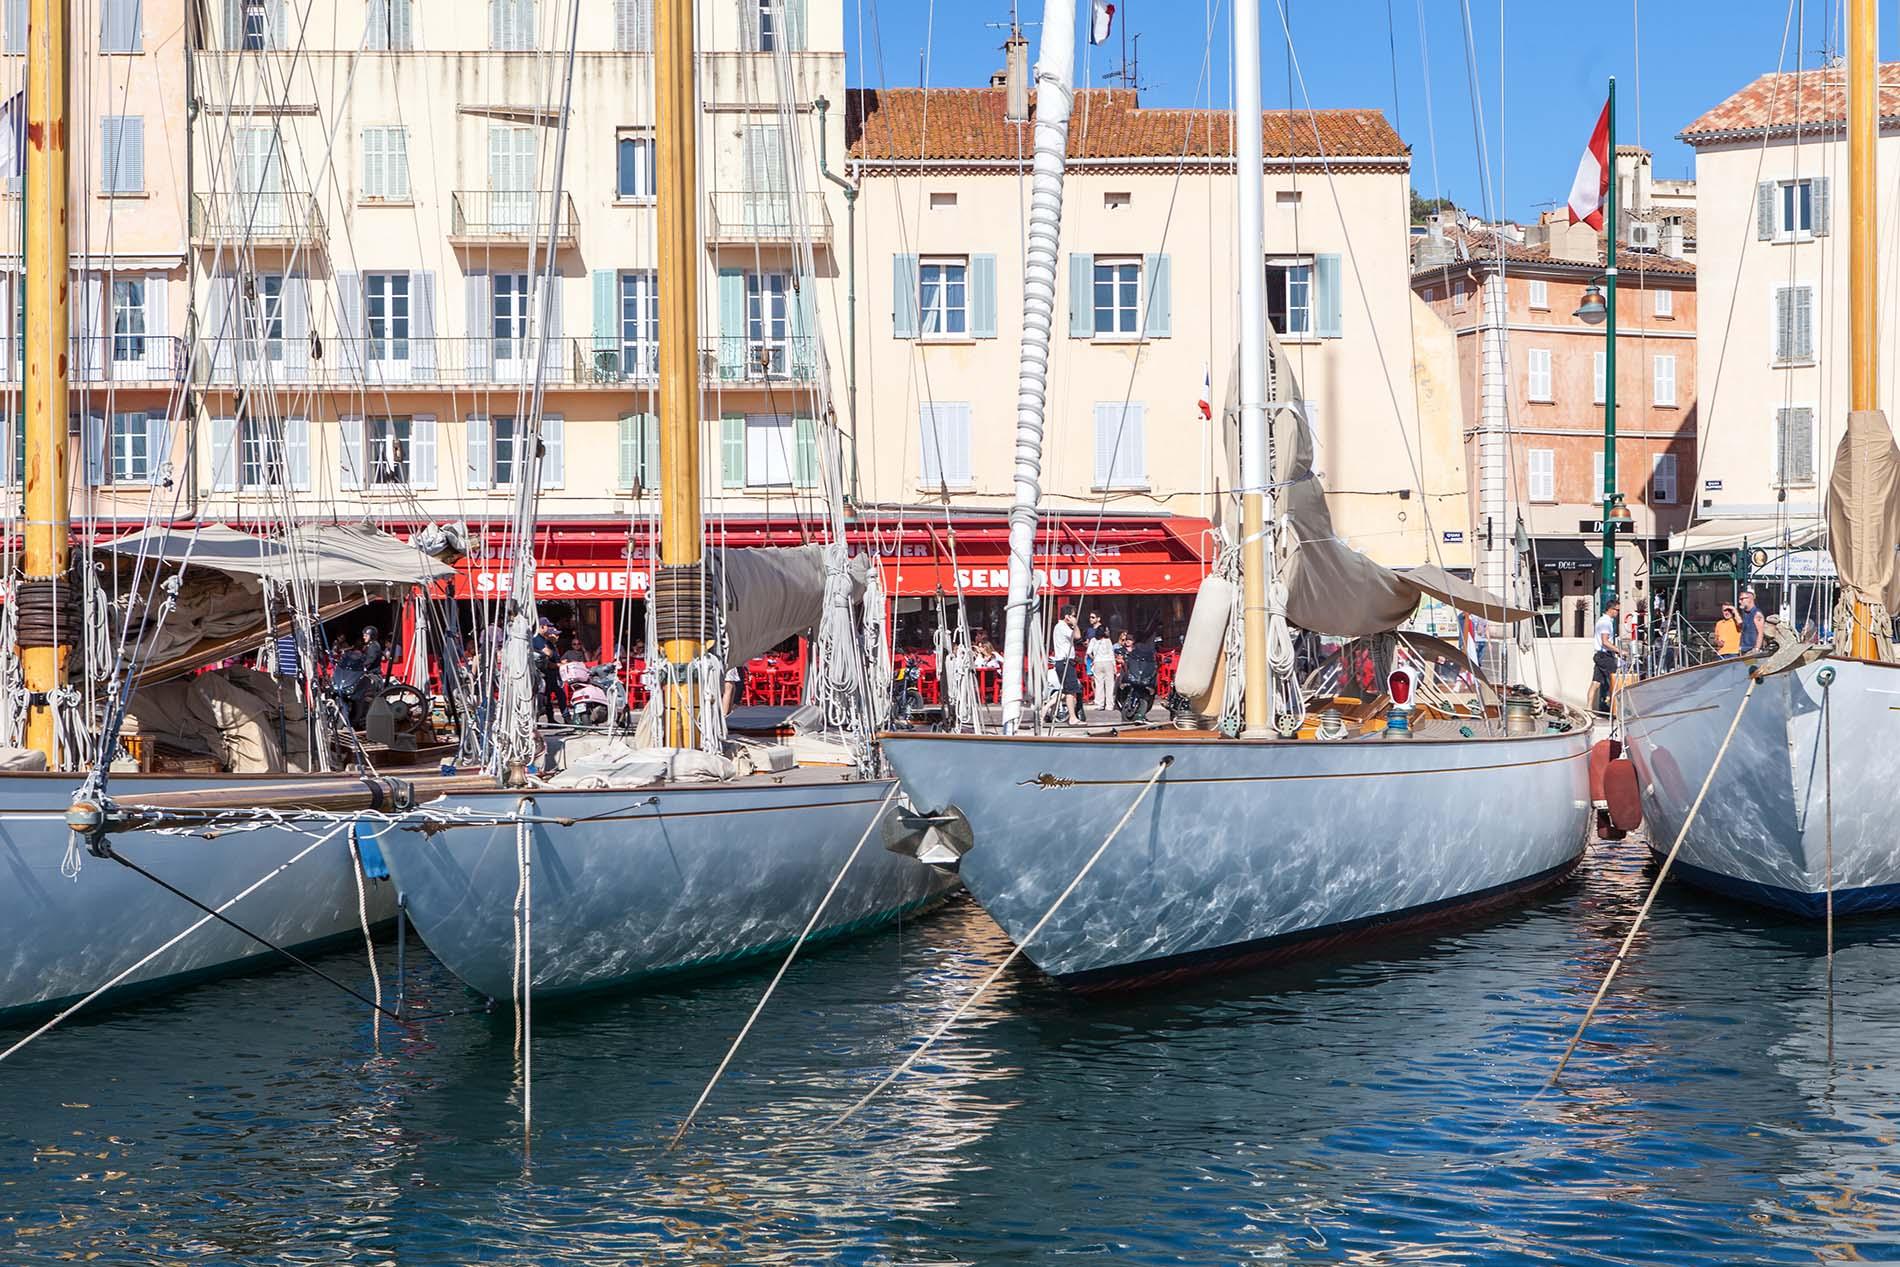 Saint Tropez yachts in the harbour